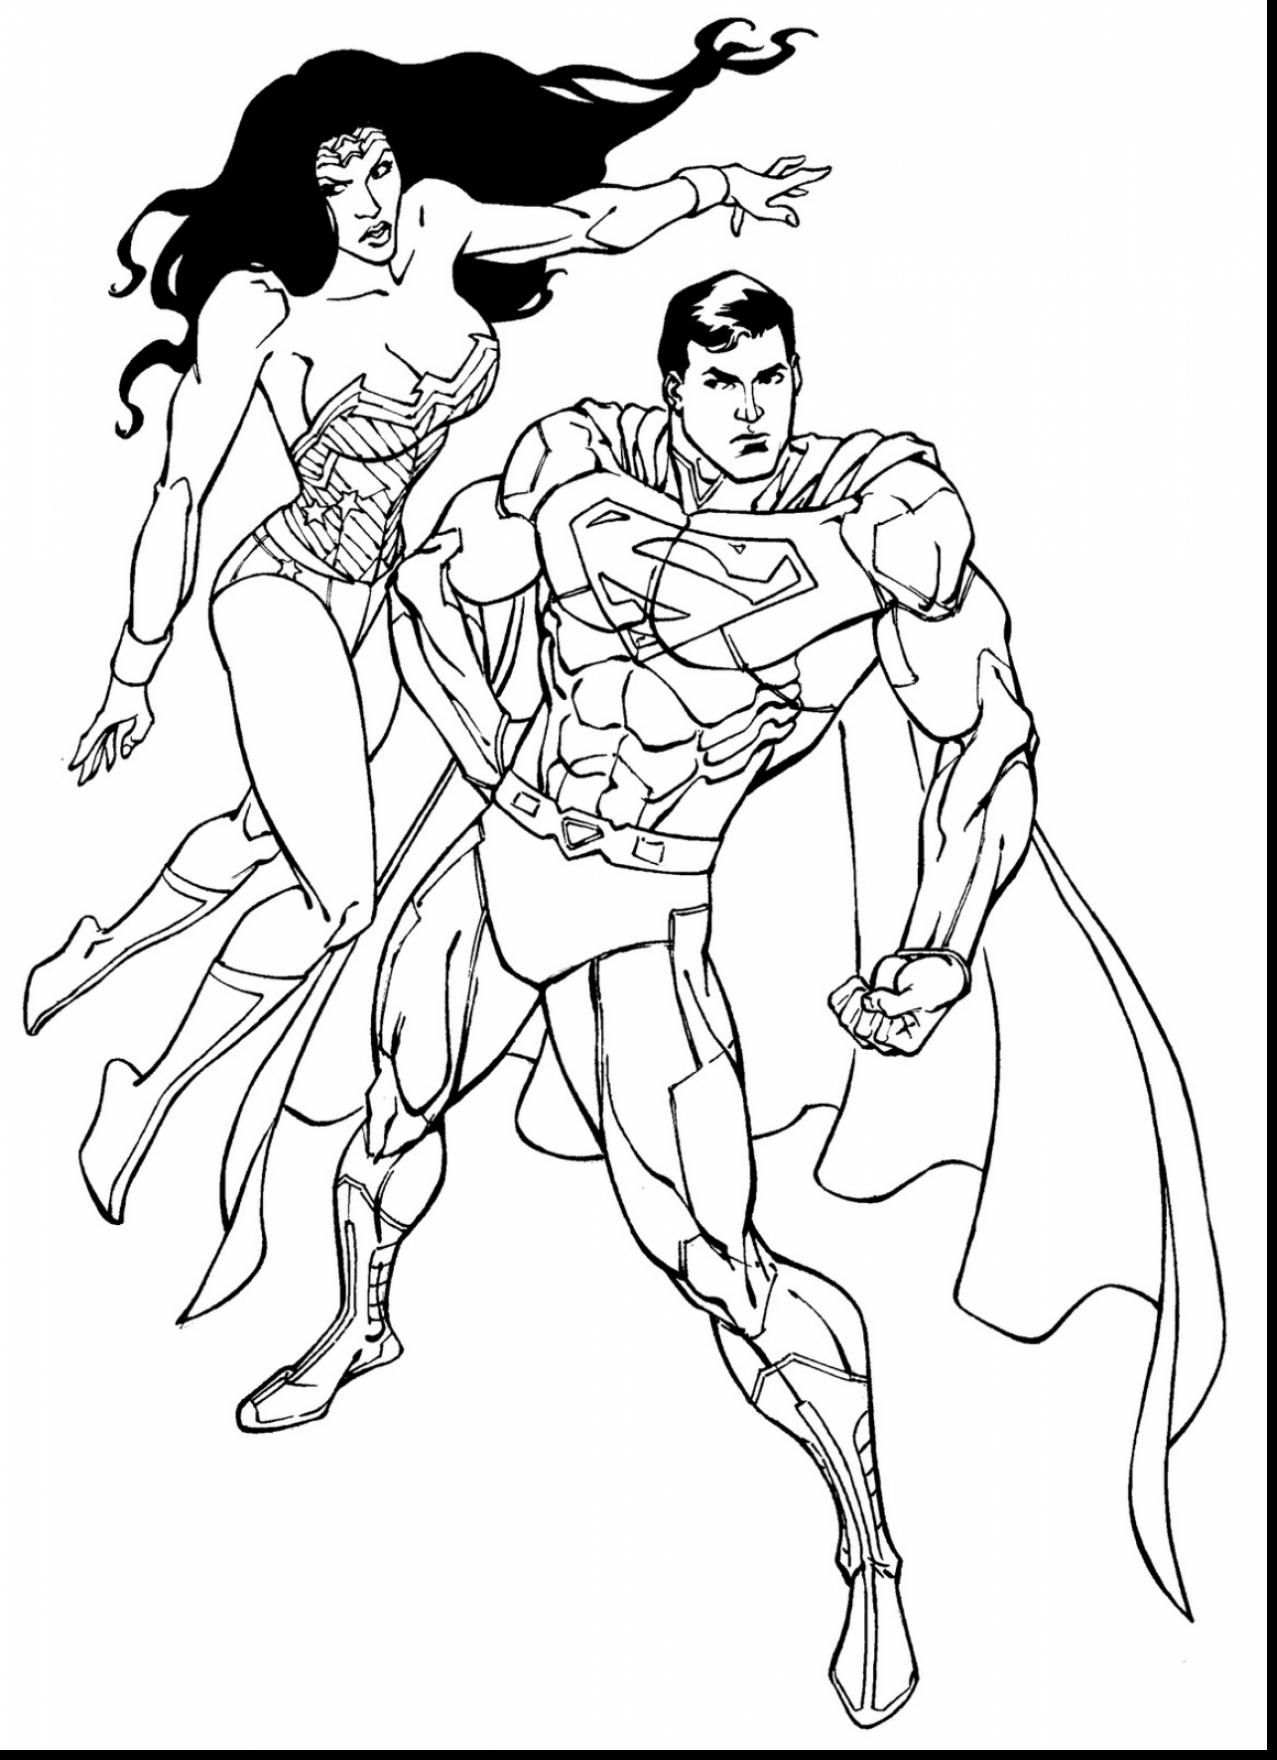 1277x1760 Wonder Woman Coloring Page Free Printable Superhero Pages Adult